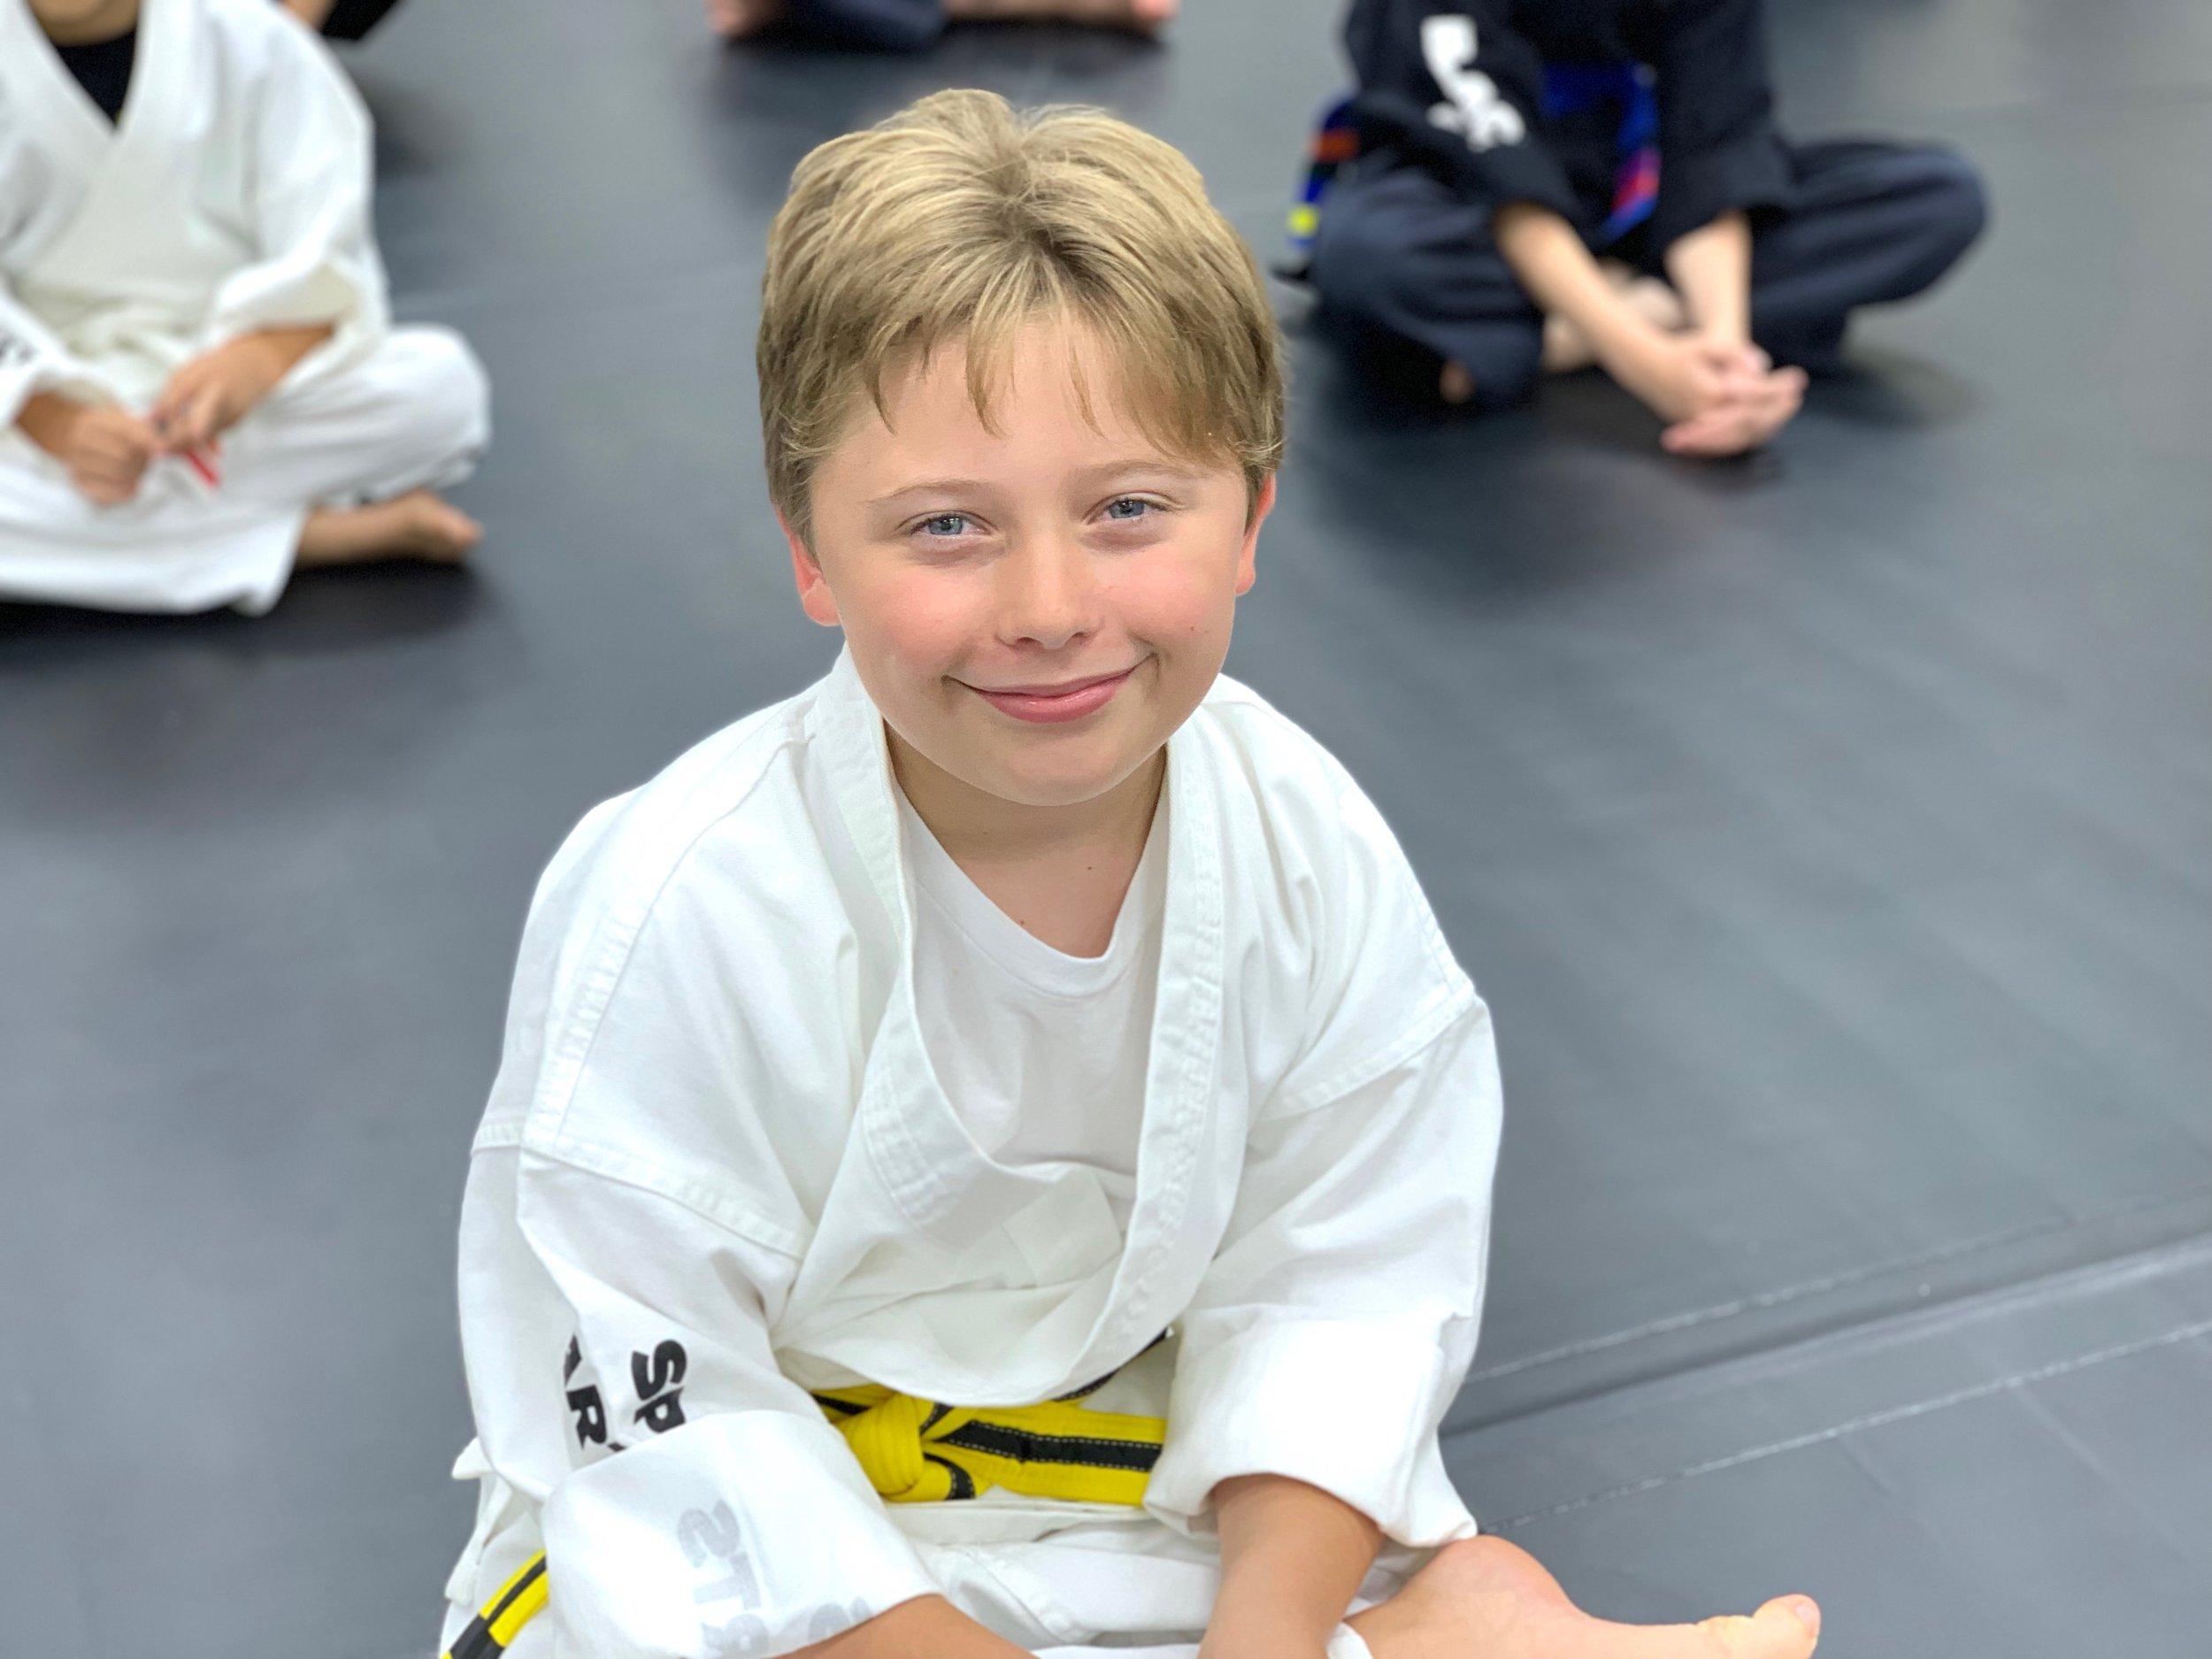 karate-kids-program-souhtlake-keller-grapevine-texas00048.jpeg